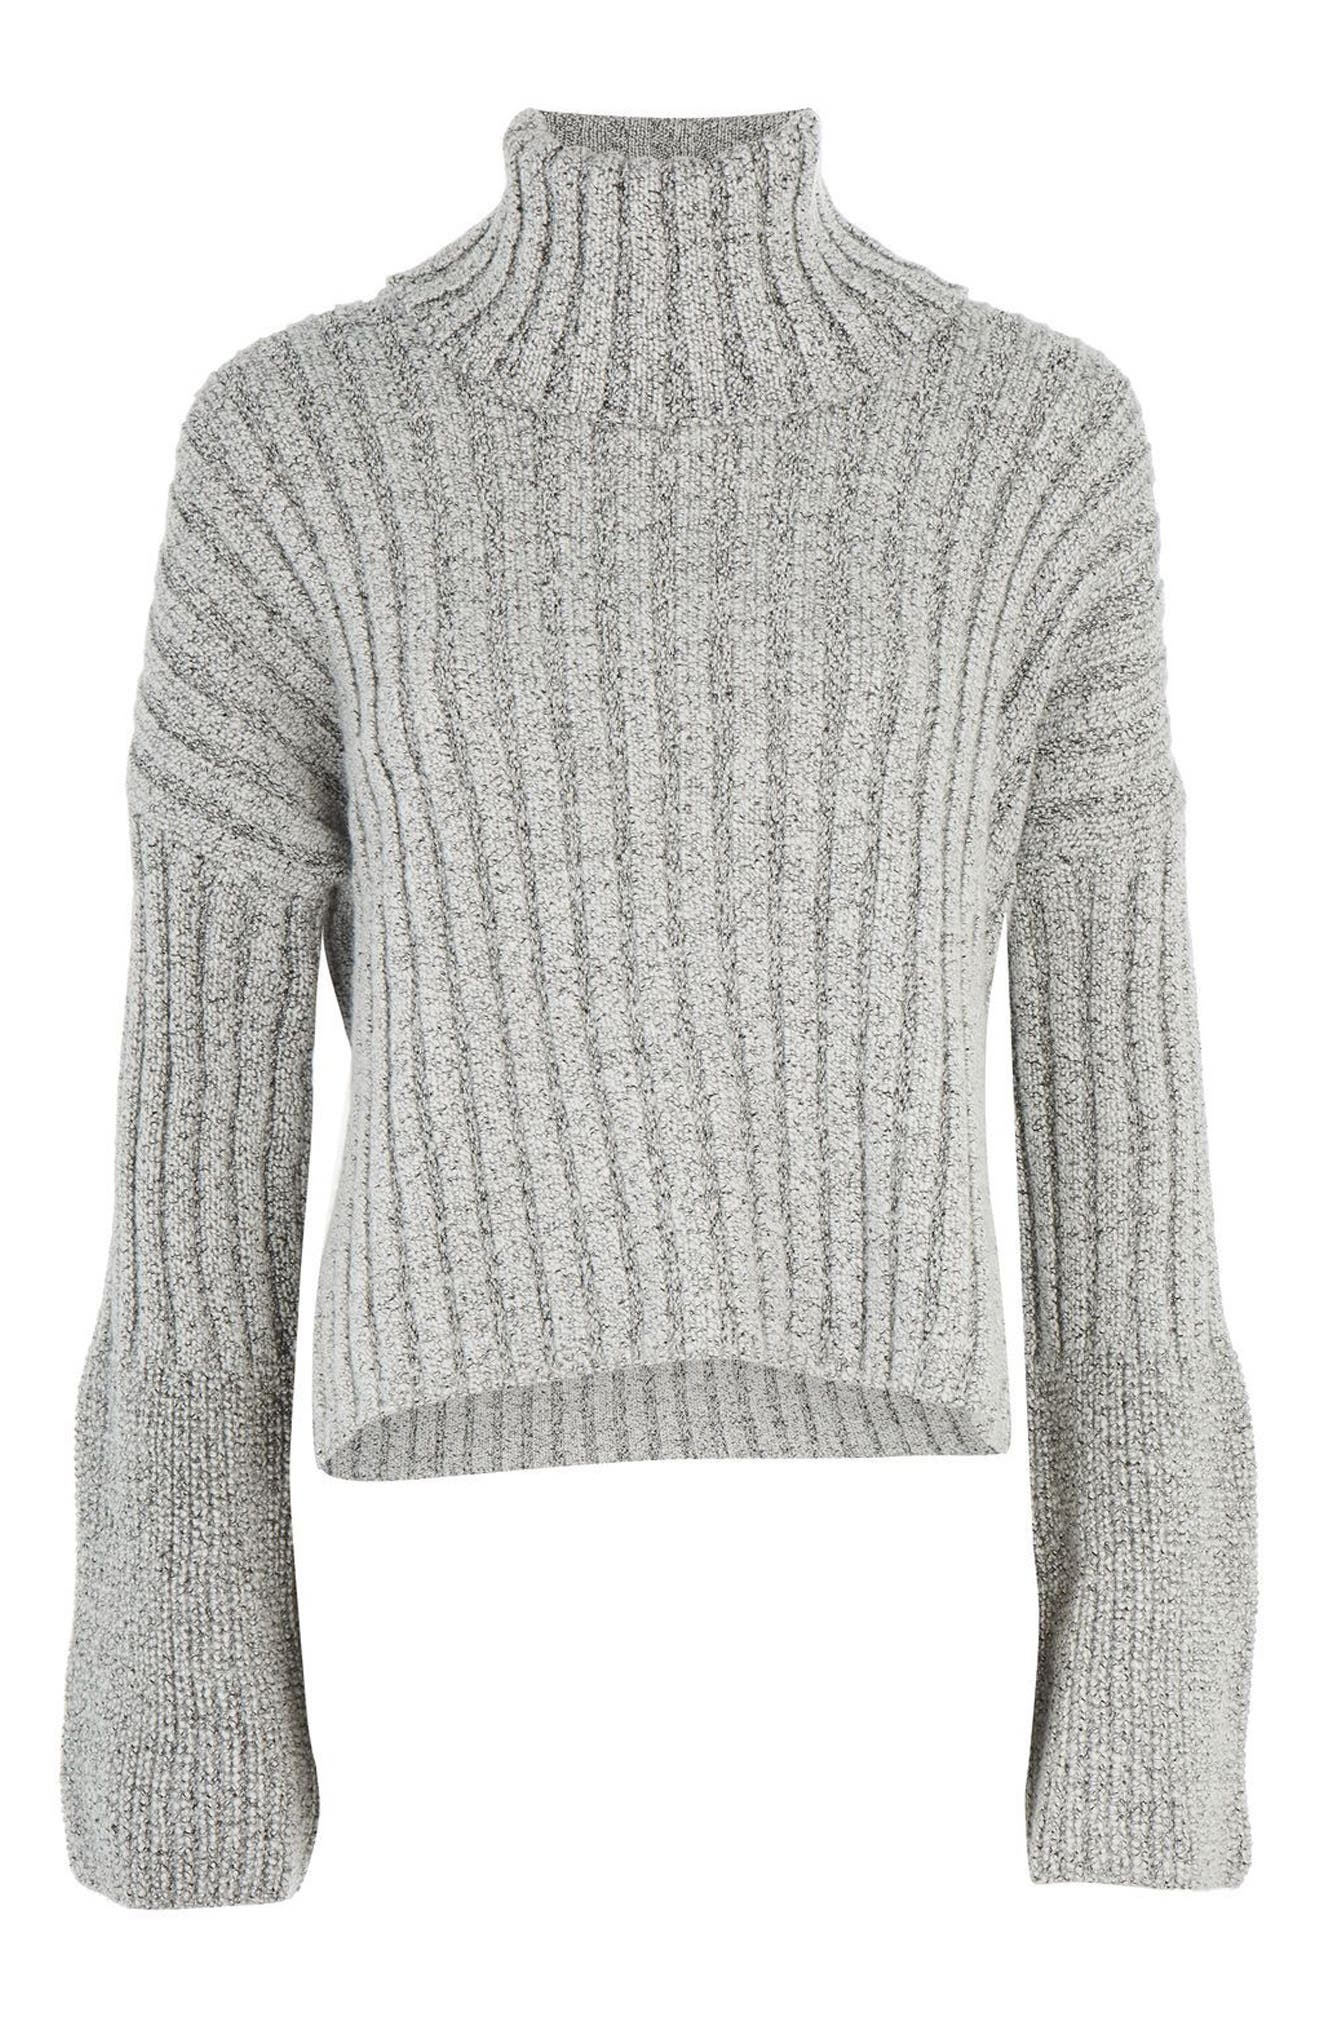 Flare Cuff Turtleneck Sweater,                         Main,                         color, Grey